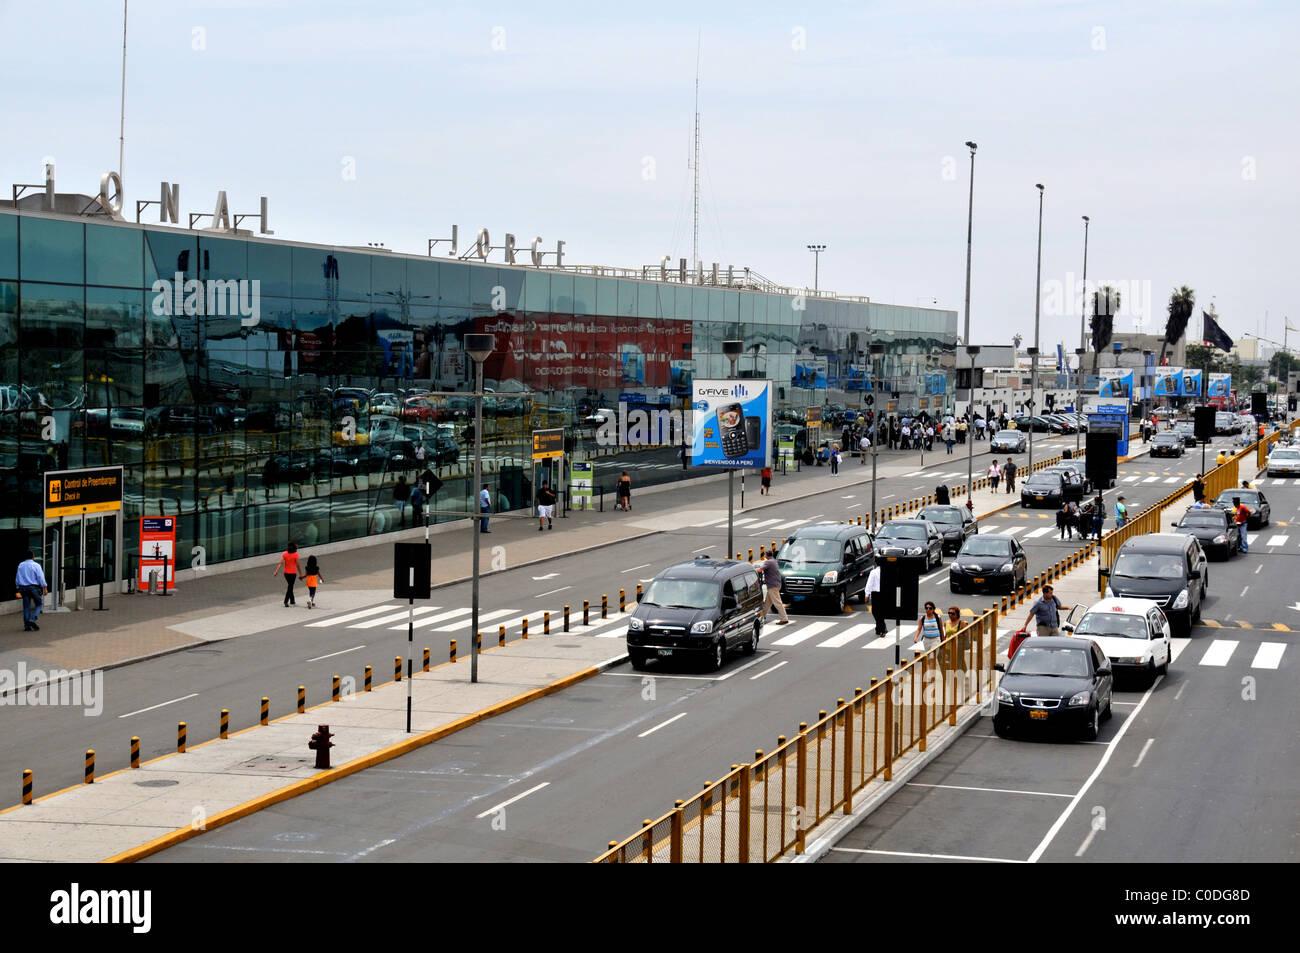 Flughafen Peru